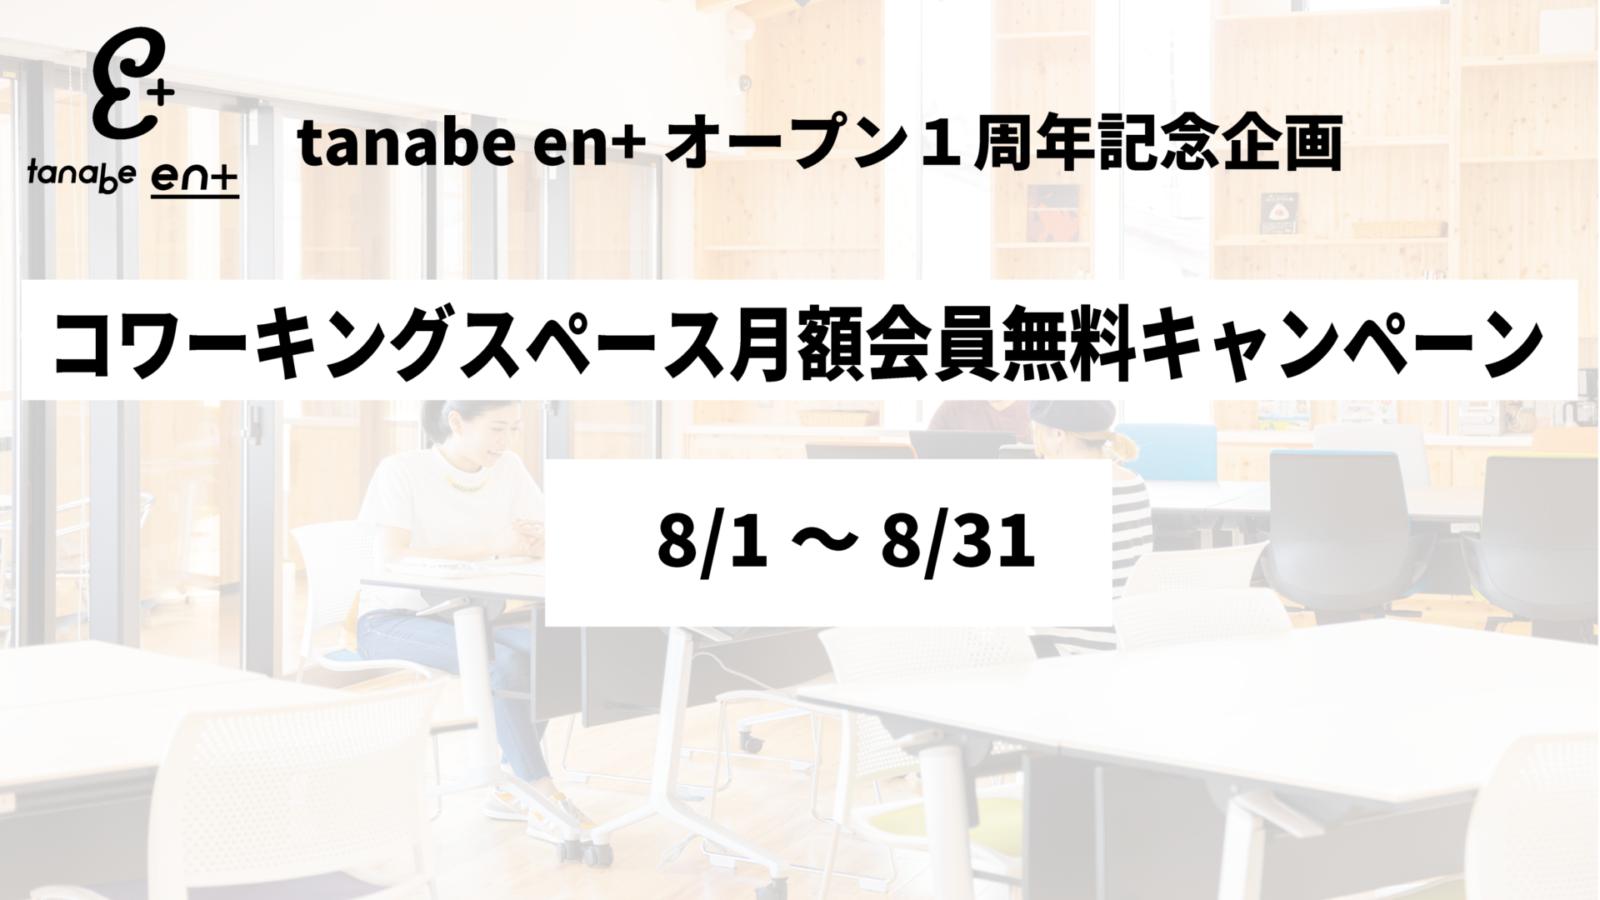 tanabe en+オープン1周年記念企画<br>コワーキングスペース月額会員無料キャンペーン